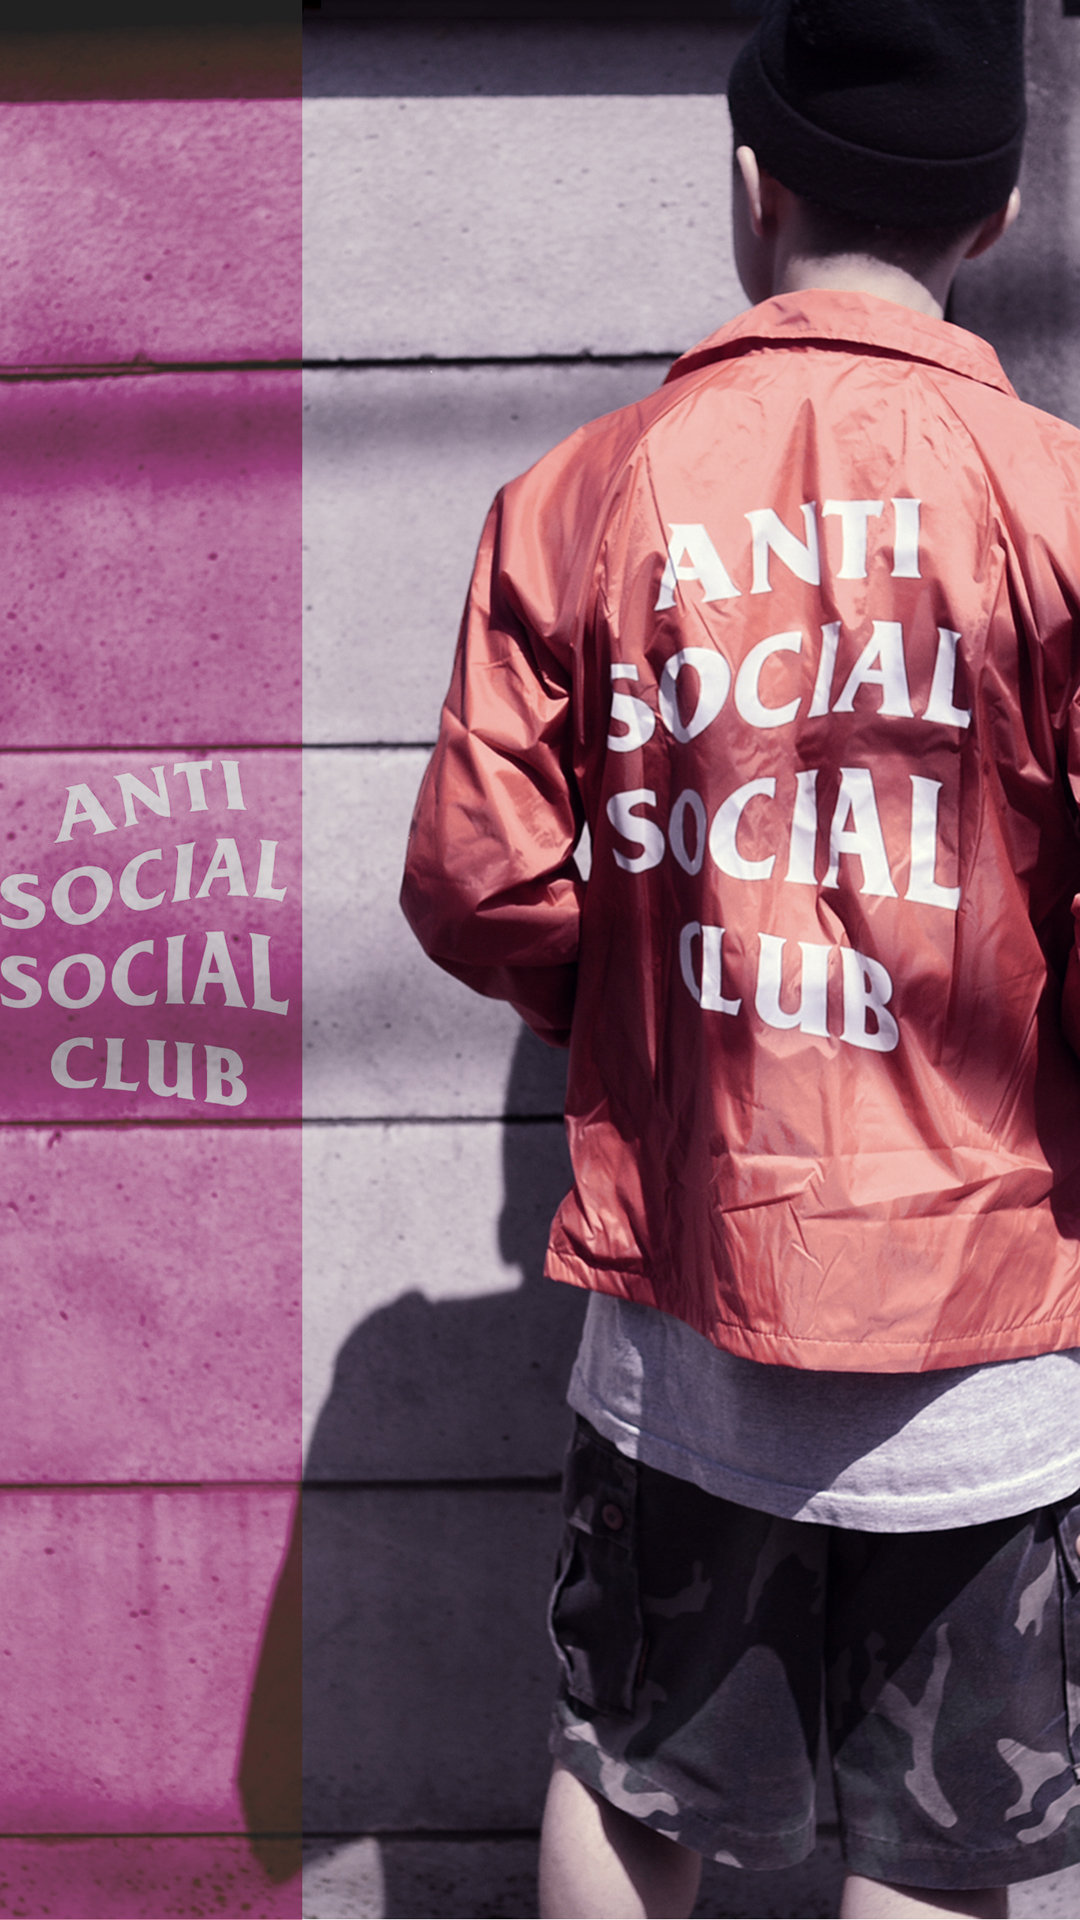 Anti Social Social Club Brand Wallpaper - CopEmLegit